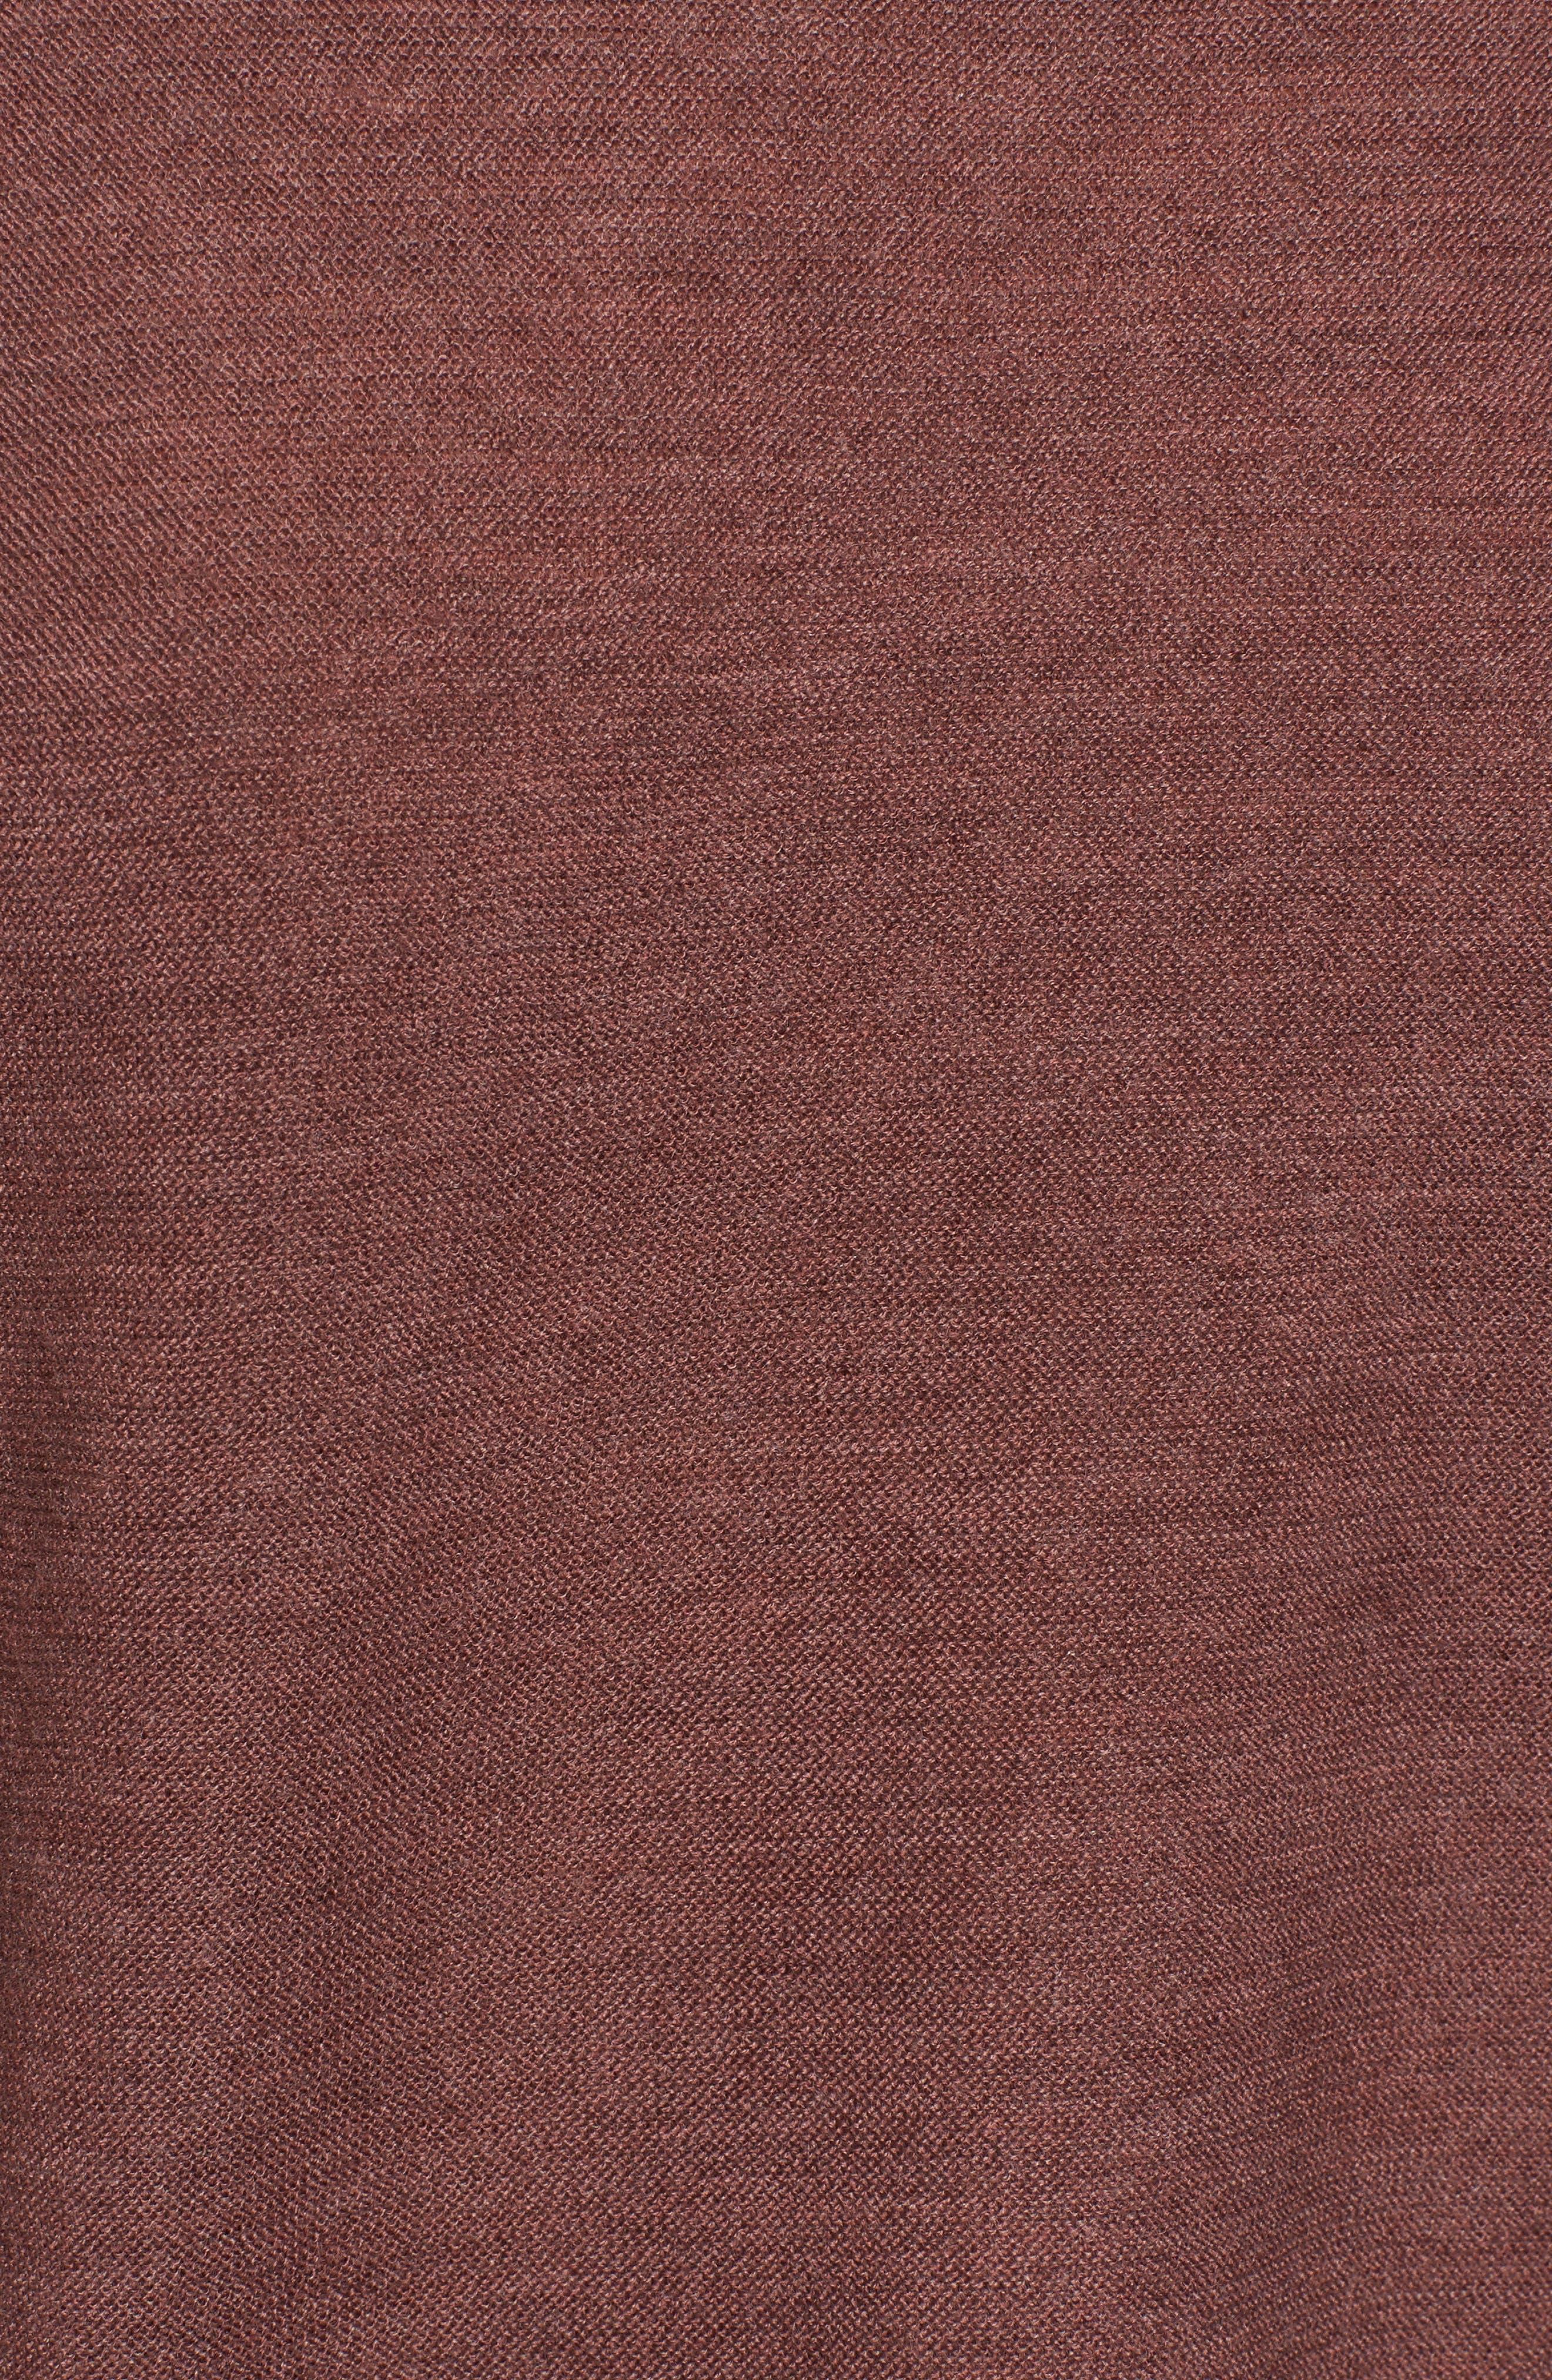 Mix Stitch Merino Bateau Neck Sweater,                             Alternate thumbnail 5, color,                             216